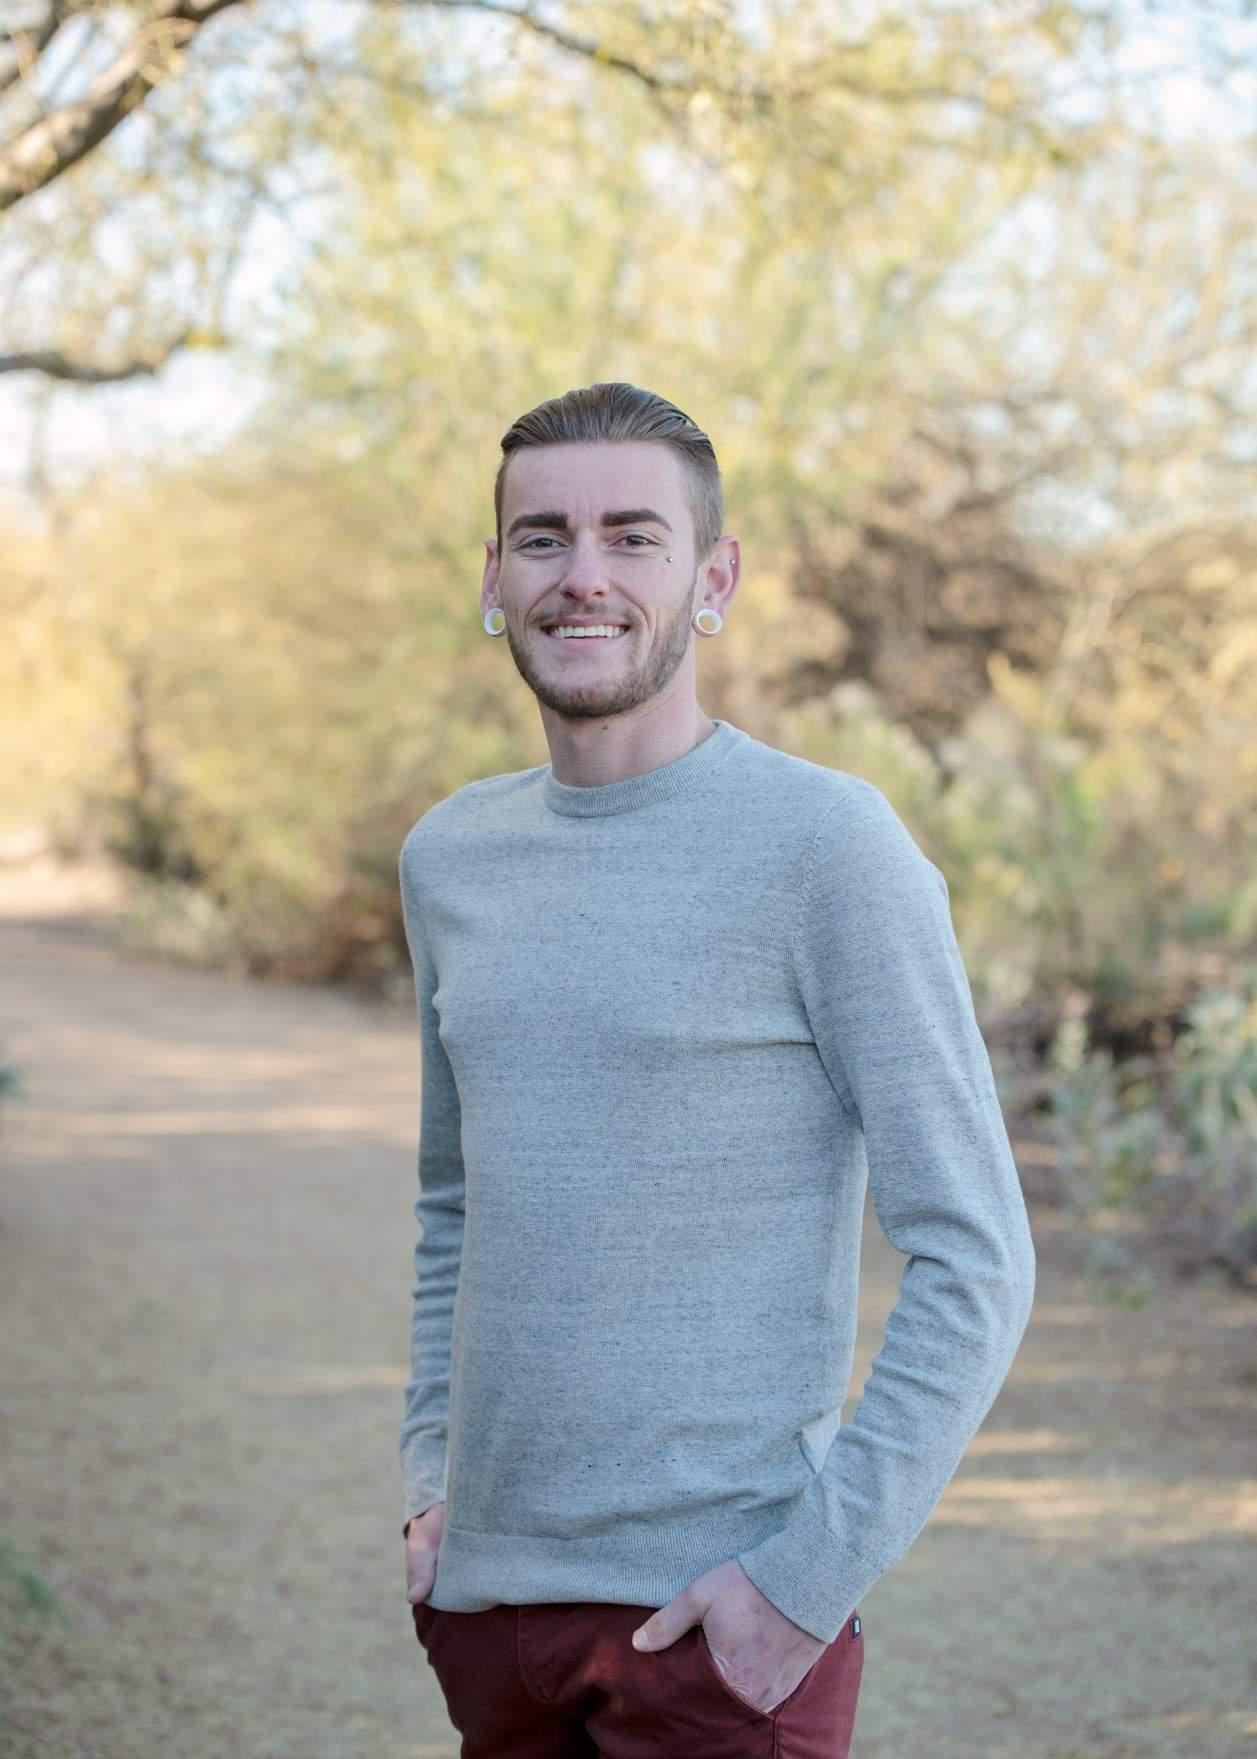 Cameron Ethan Steck